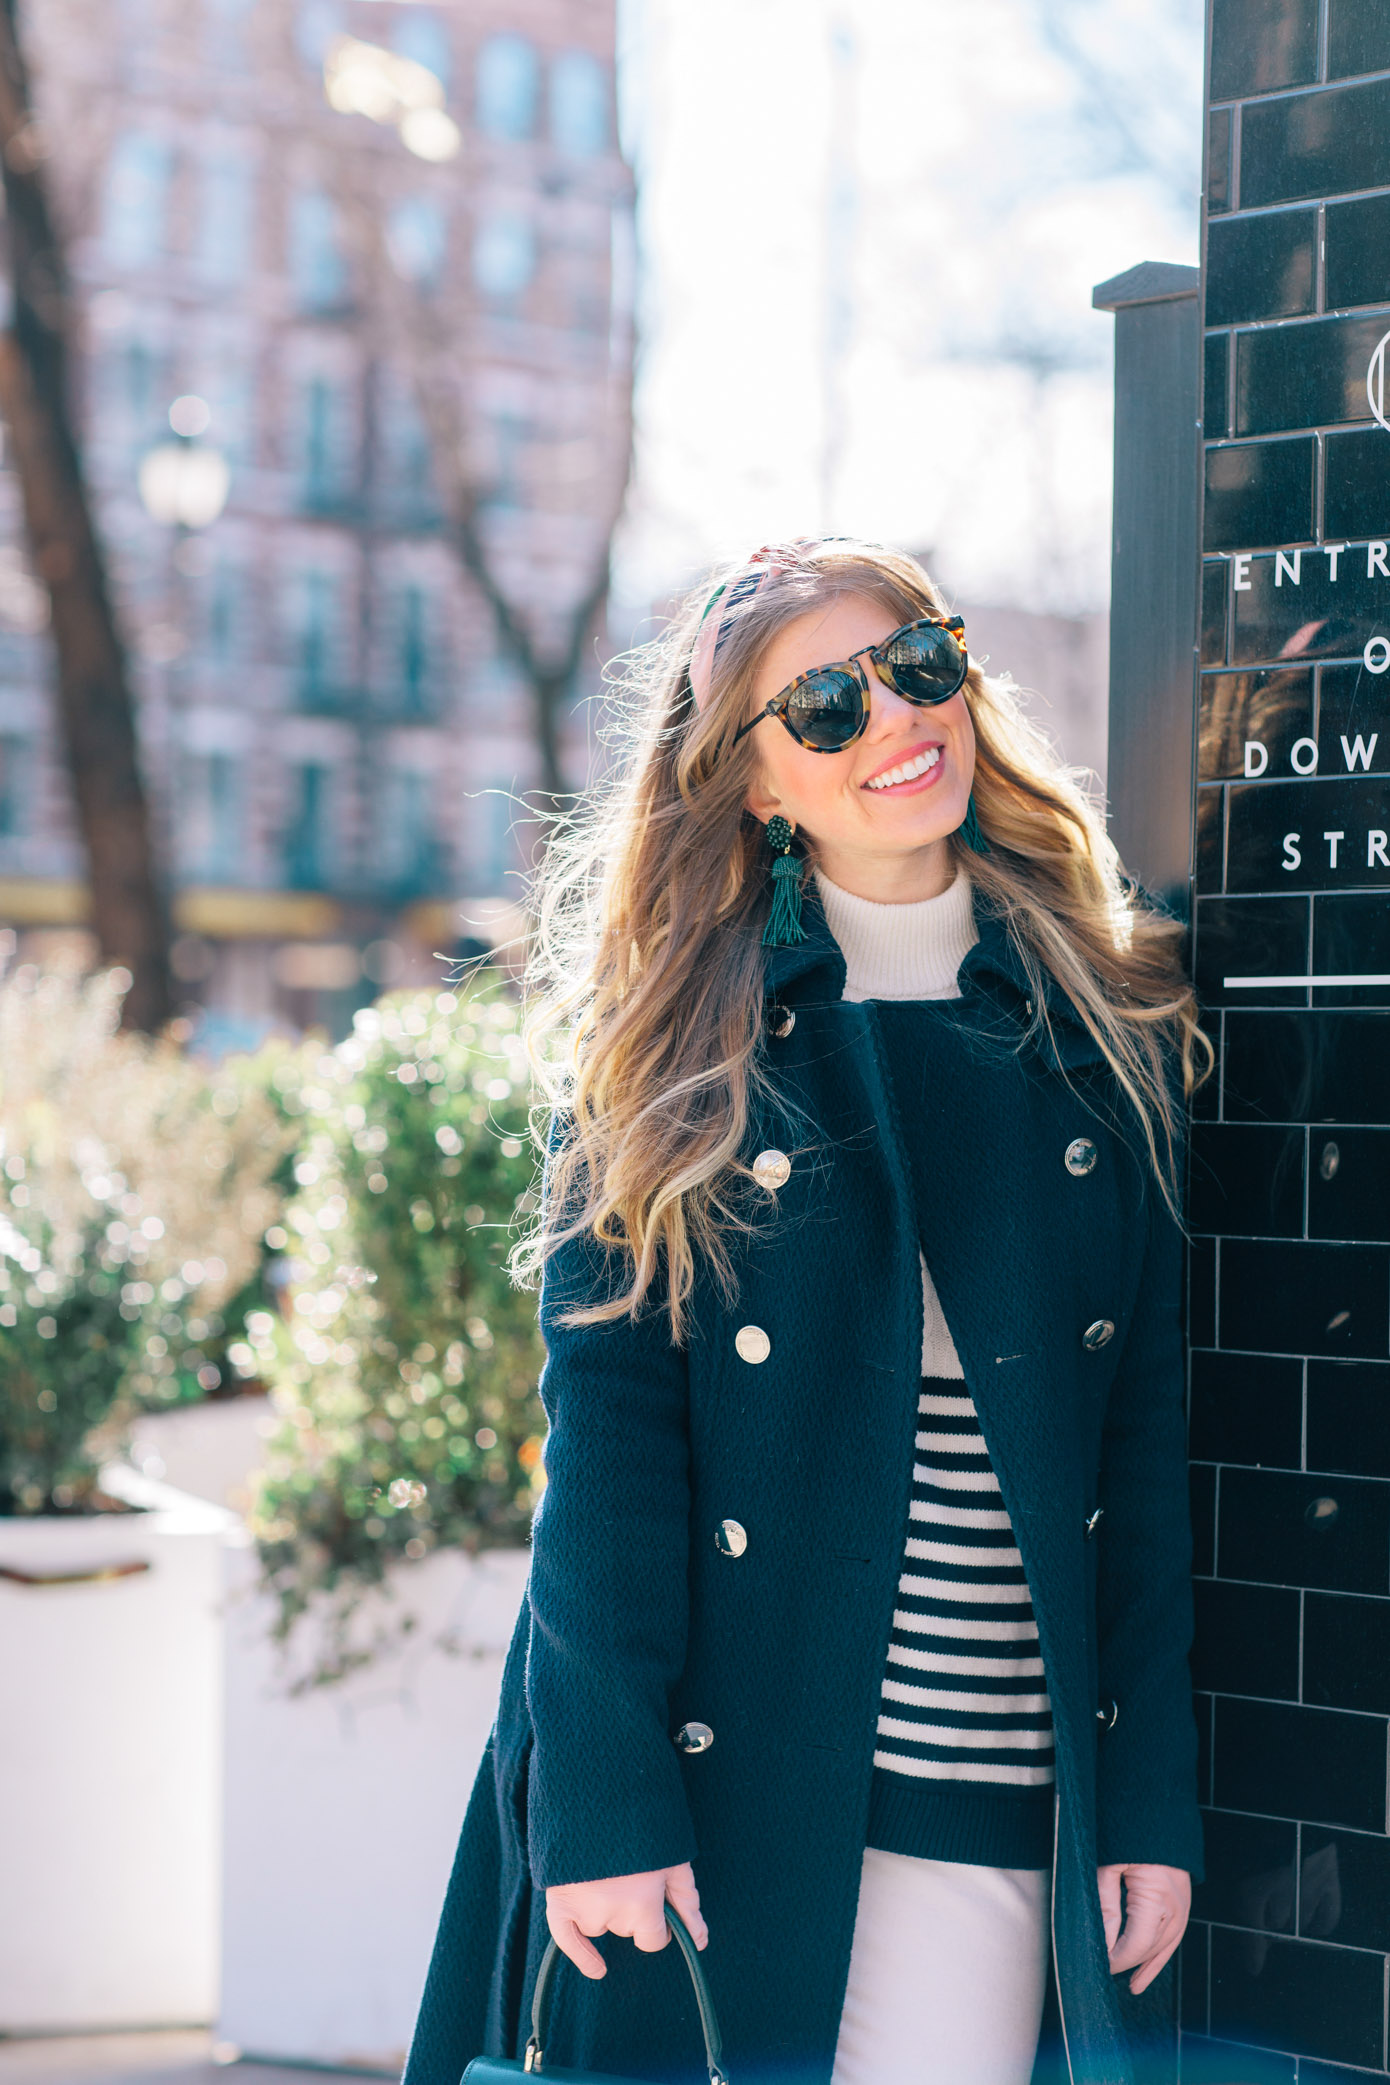 NYFW Recap | Blair Waldorf Inspired Outfit | Louella Reese Life & Style Blog